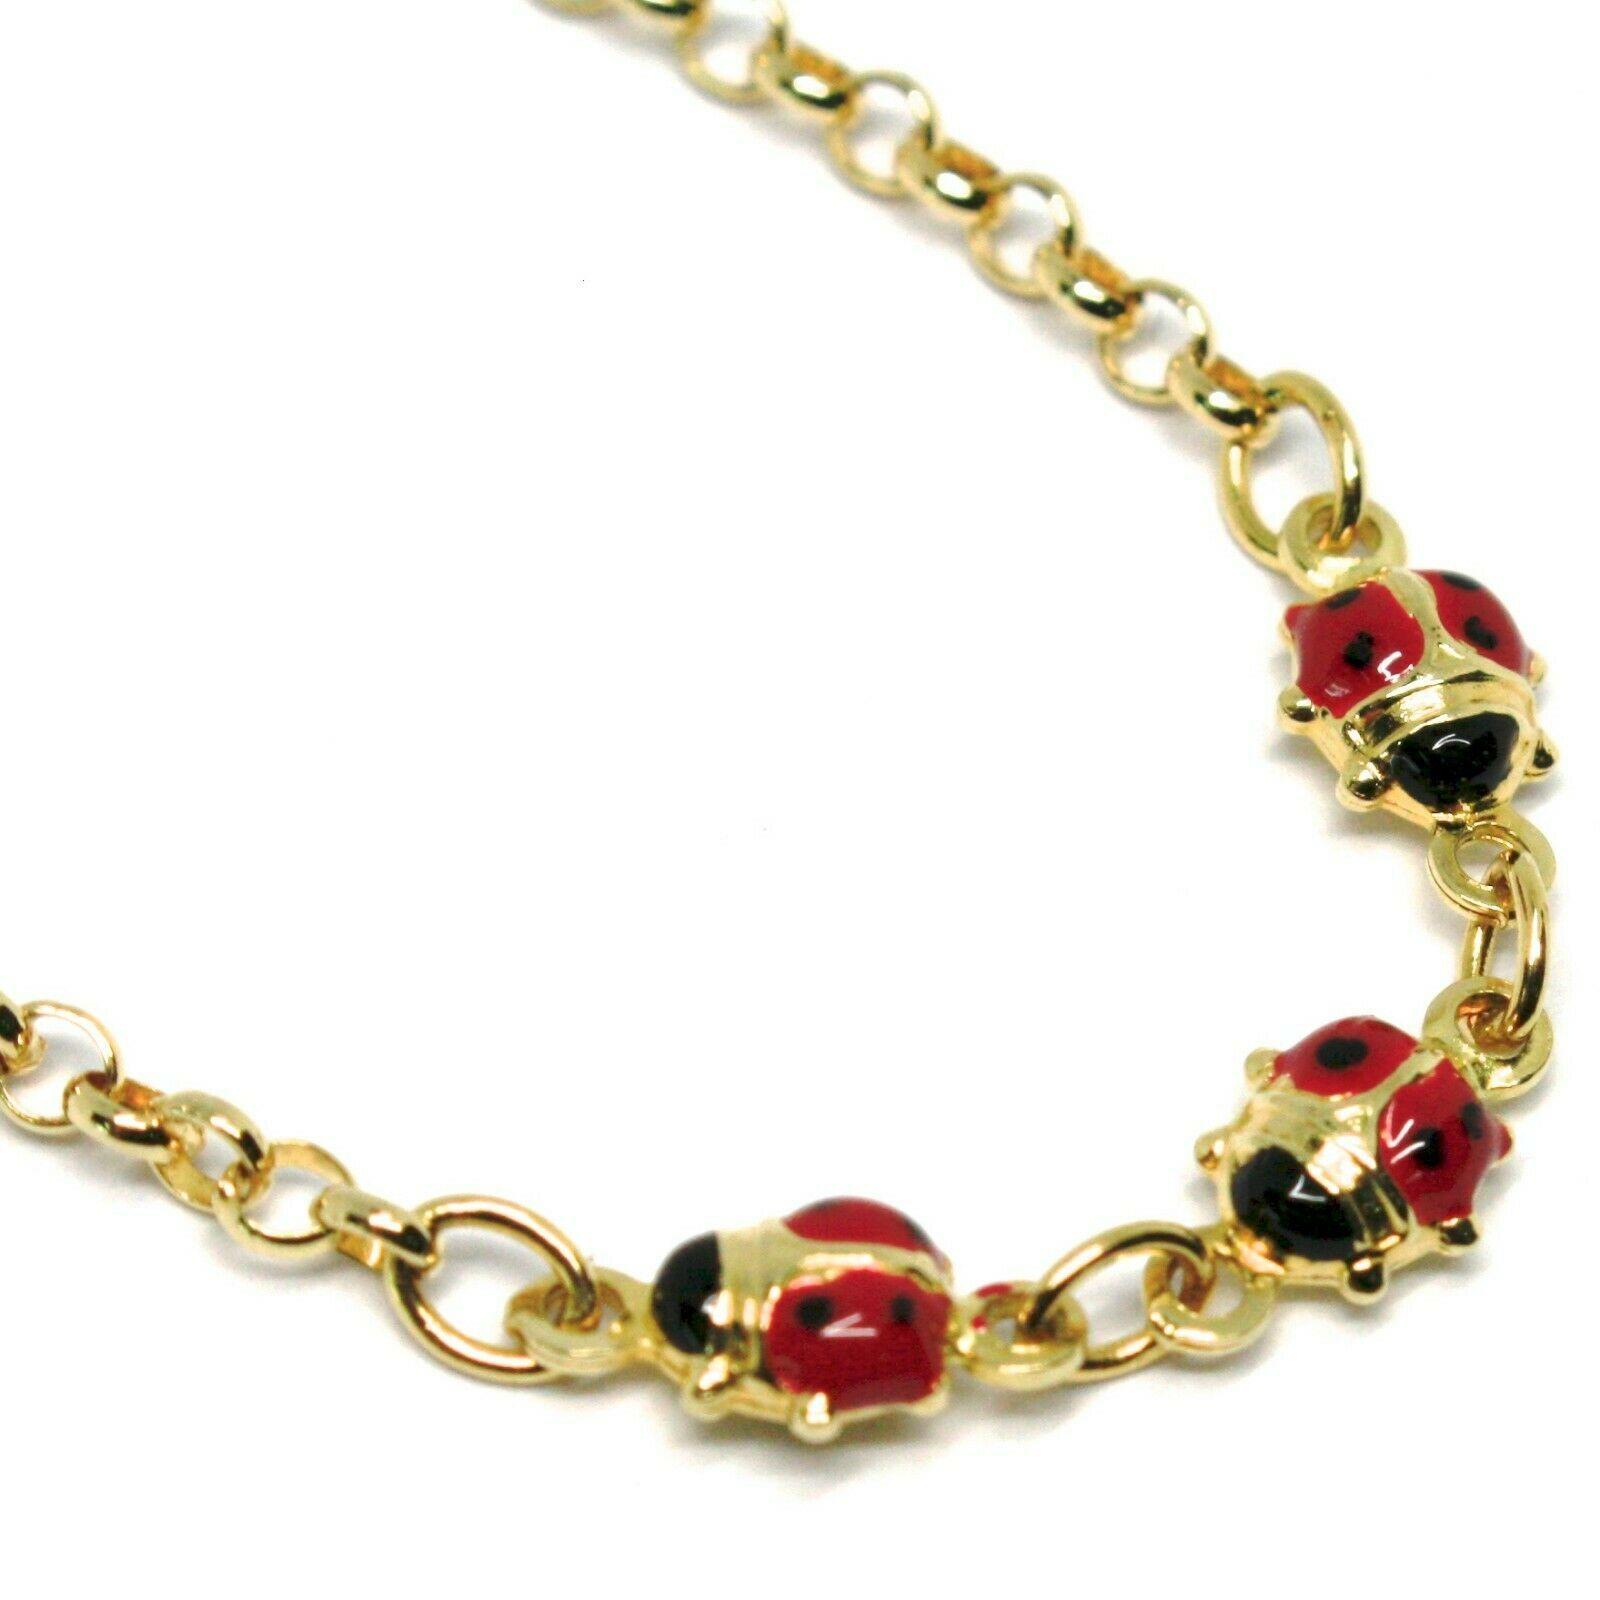 Bracelet or Jaune 18K 750, Fille, Trois Coccinelle Email, 16.5 CM